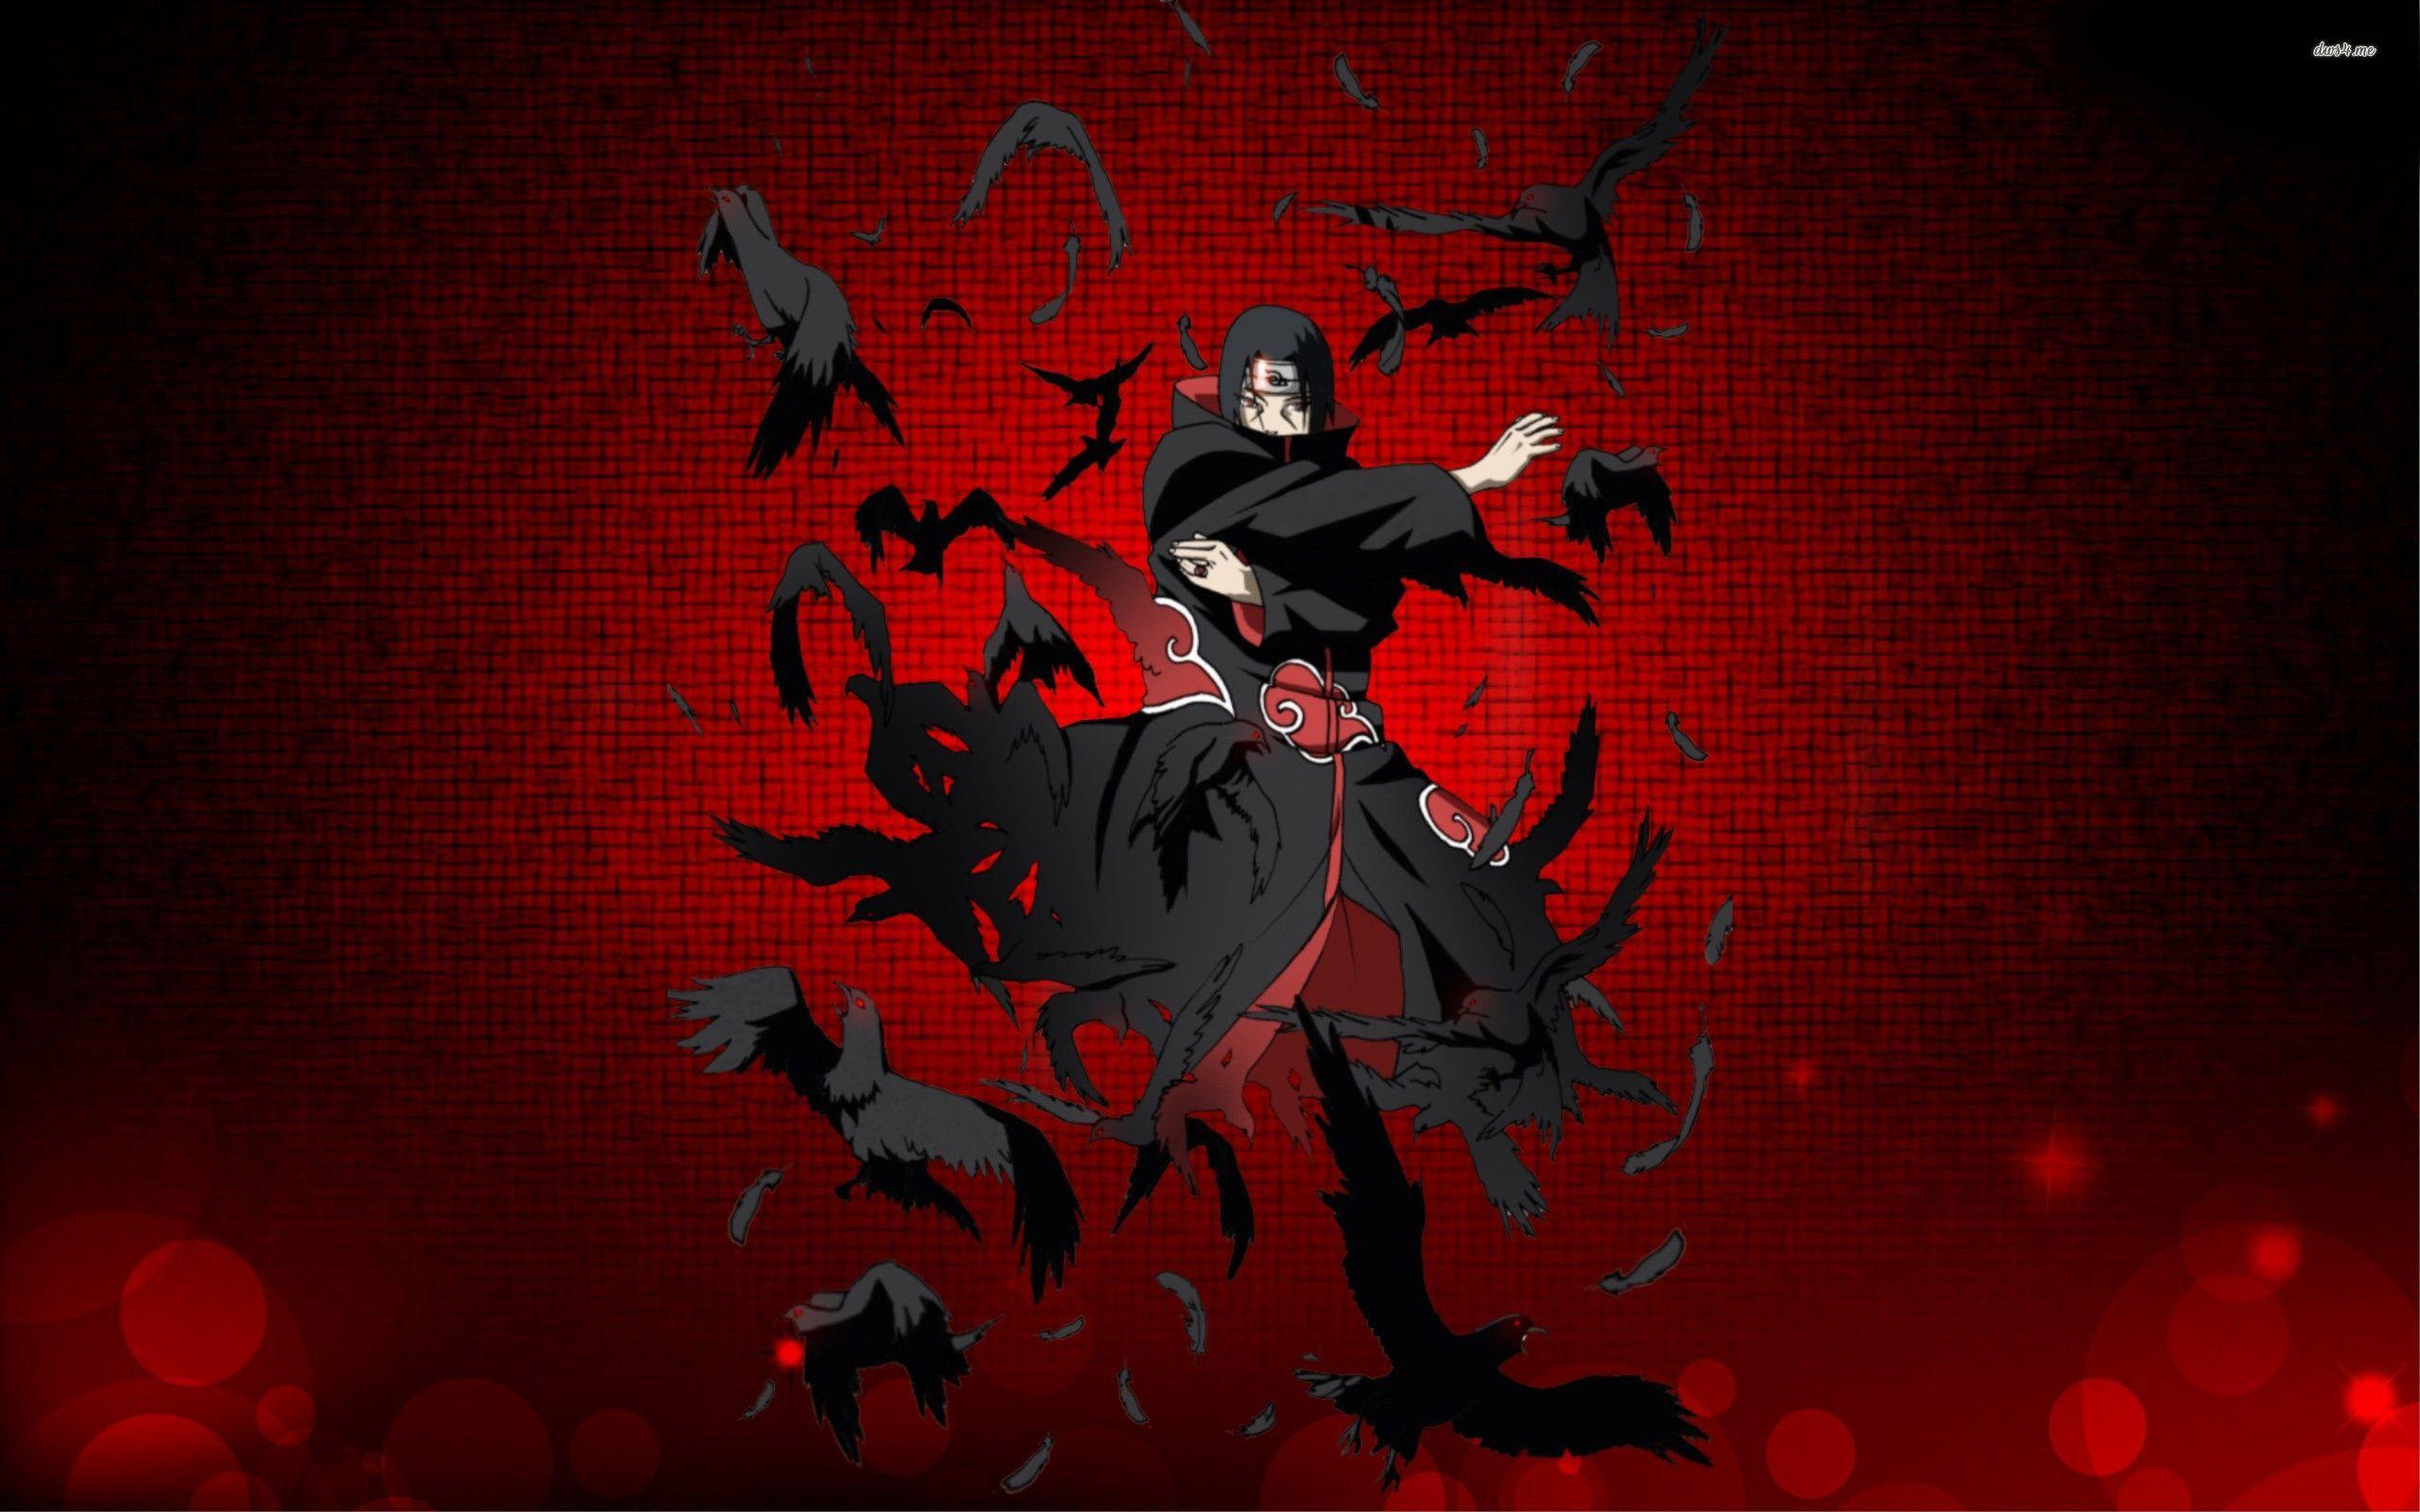 Res 2560x1600 Anime Naruto Itachi Uchiha Wallpaper Naruto Gambar Seni Gelap